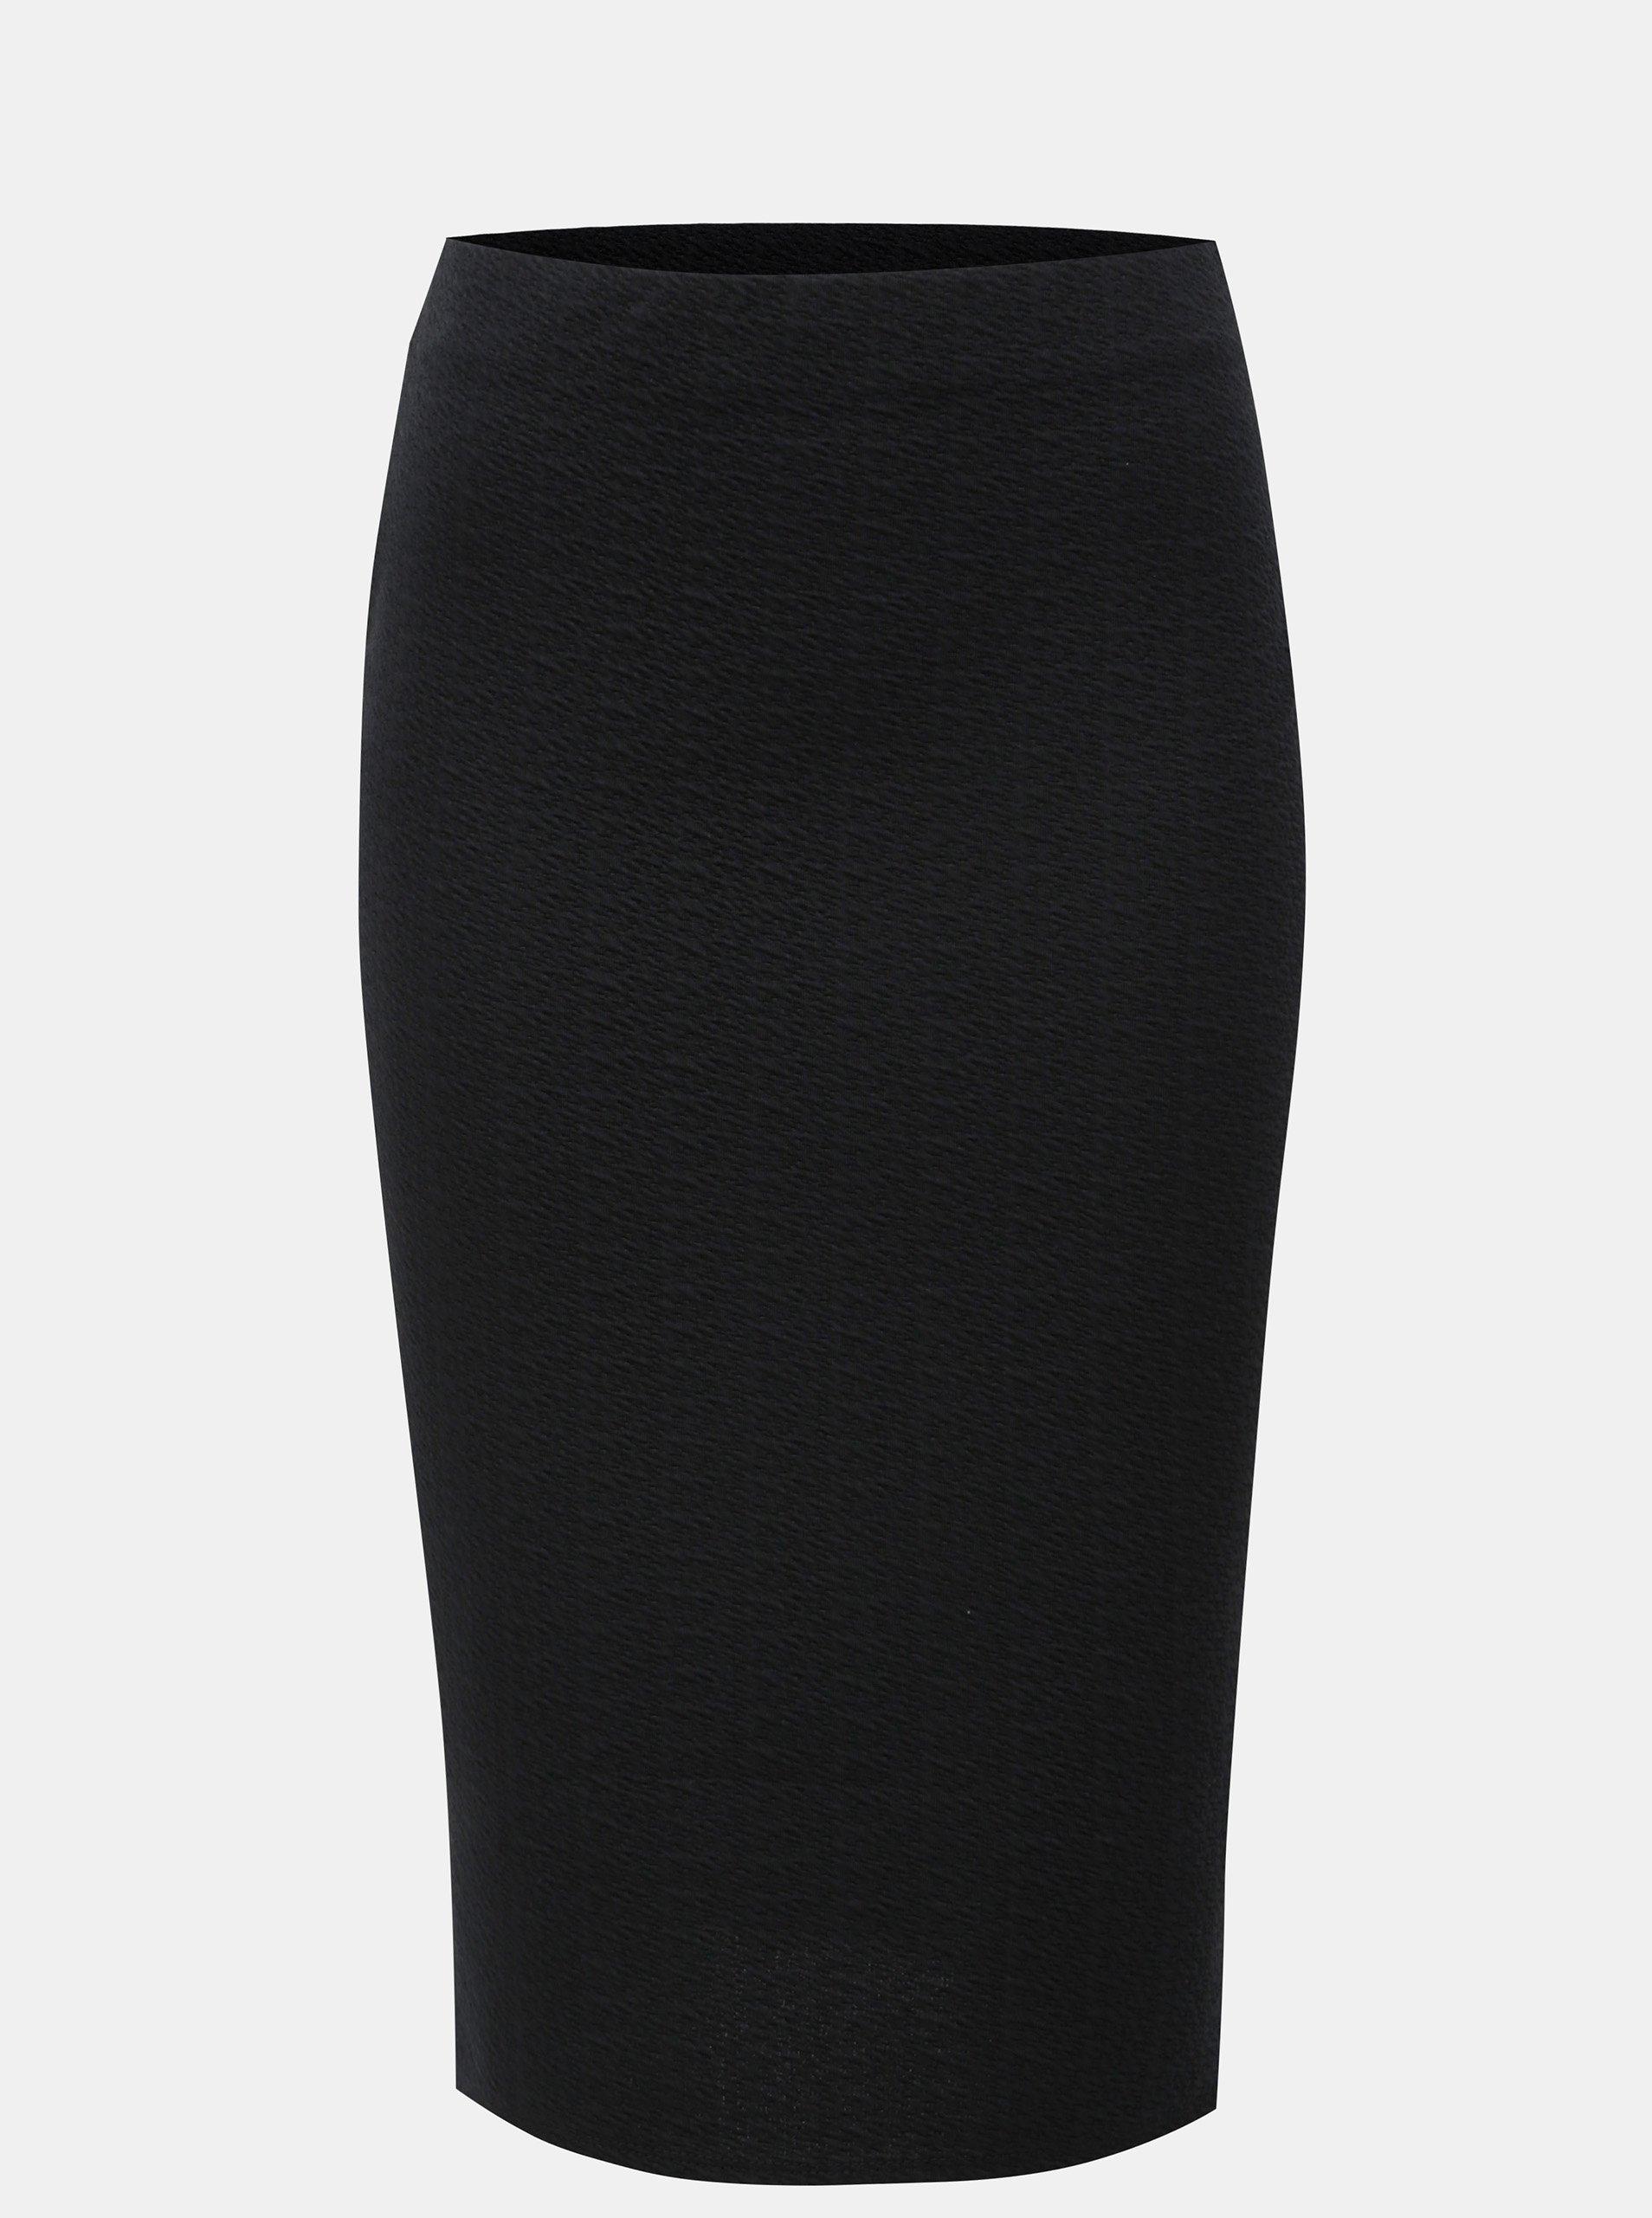 73f34ae6f57 Černá pouzdrová sukně Dorothy Perkins